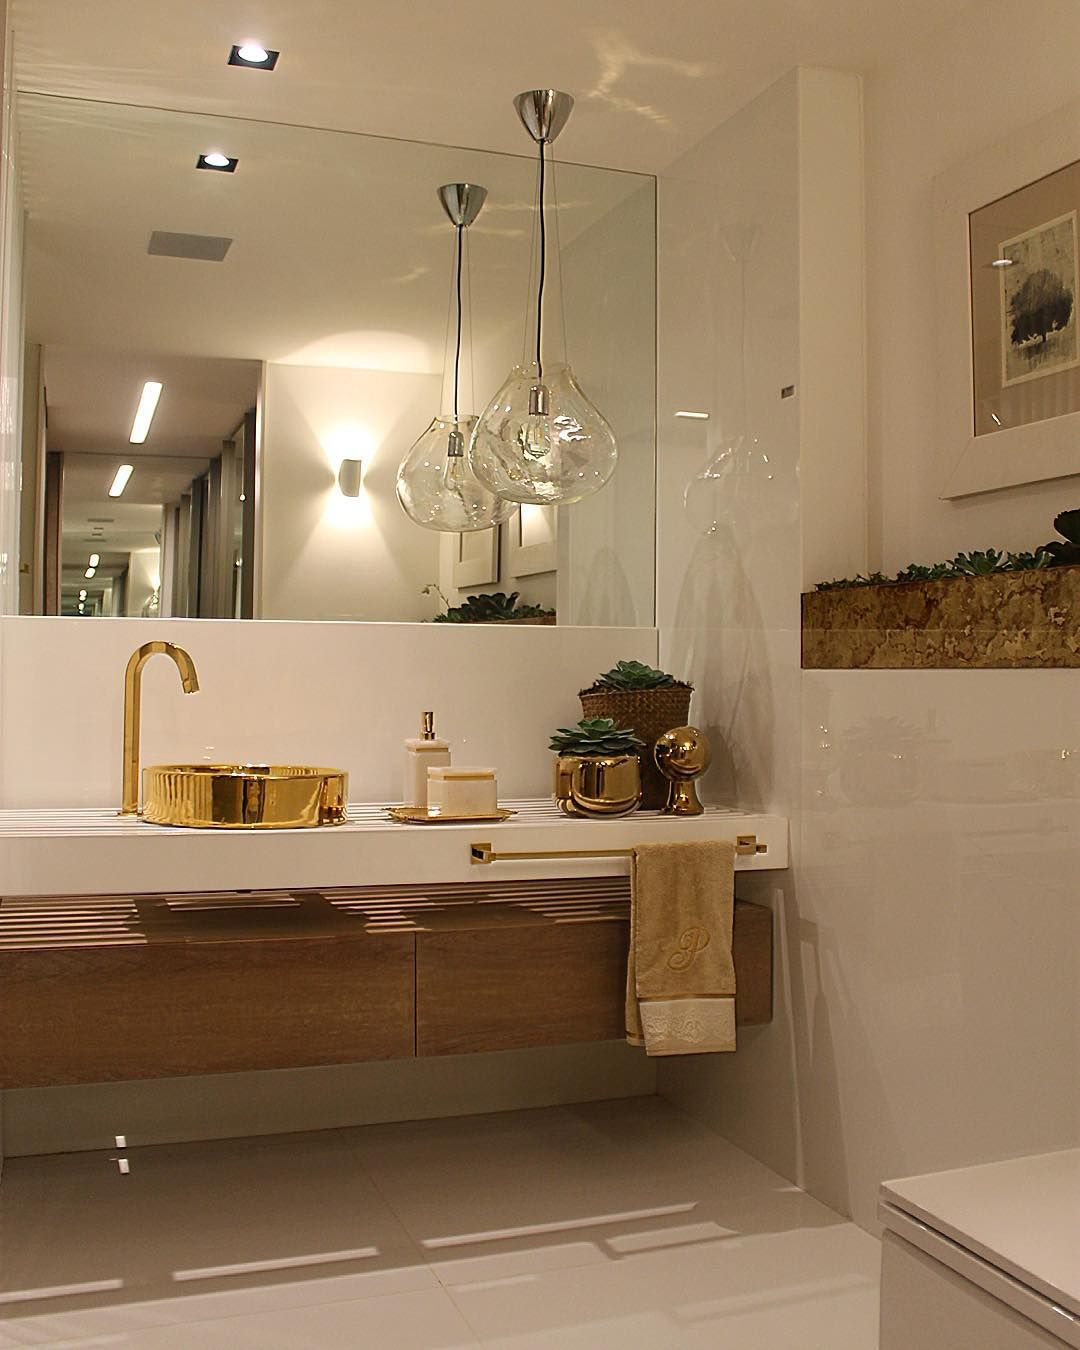 Casa Cor Brasília 2015 repare na Cuba e nos metais dourados (Deca) no banhei -> Cuba Para Banheiro Pequena